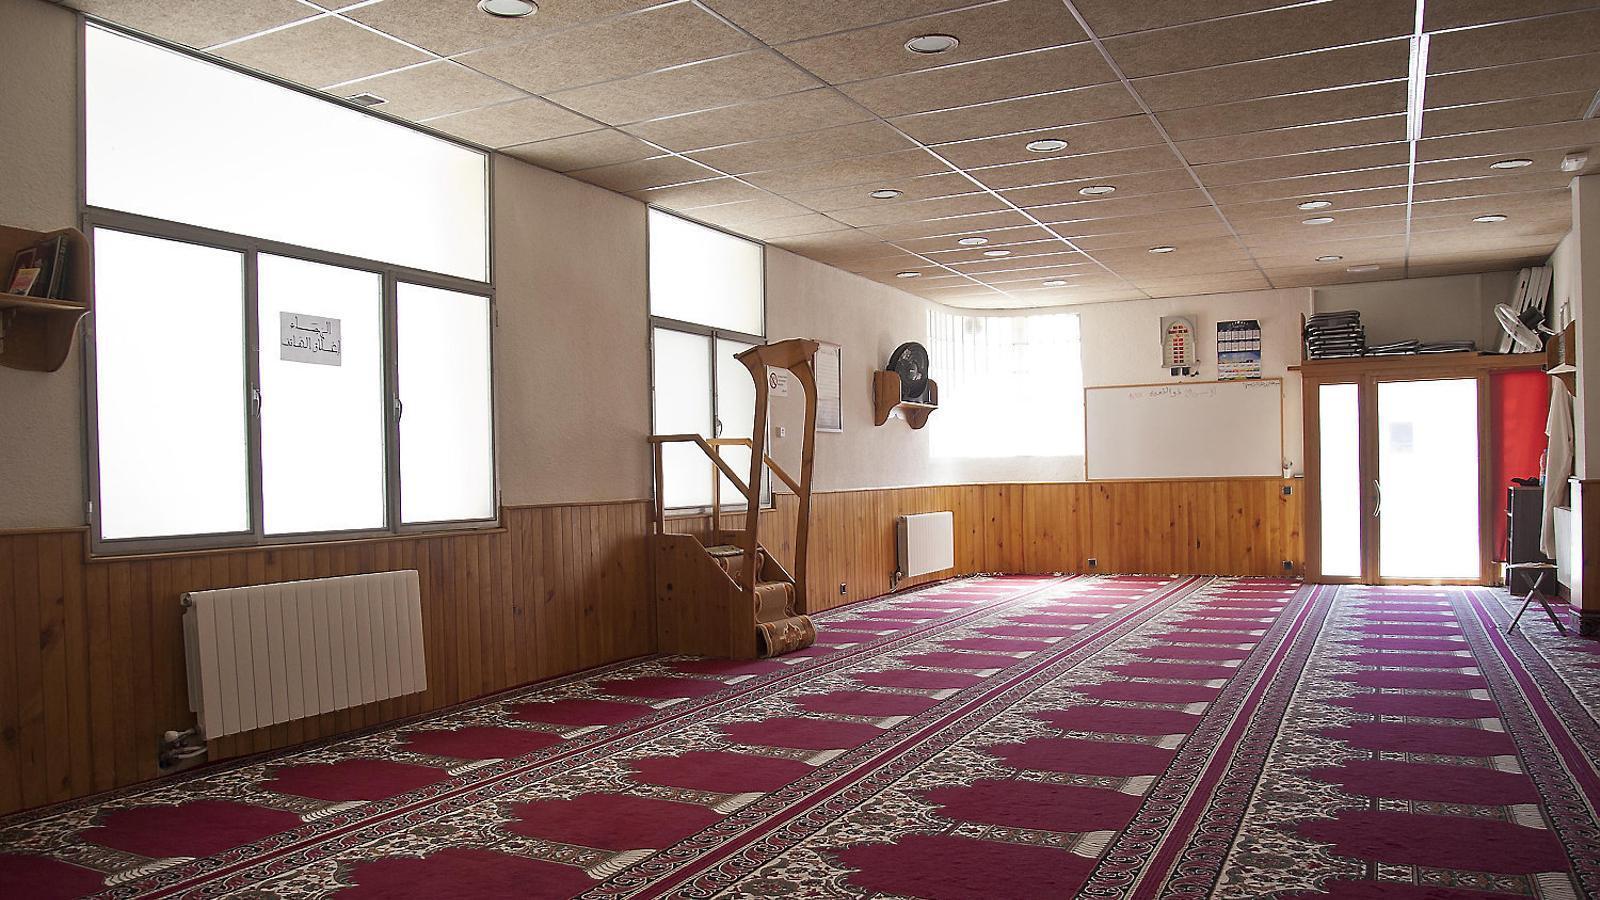 Imatge de l'oratori de Ripoll on va treballar d'imam Abdelbaki es Satty.